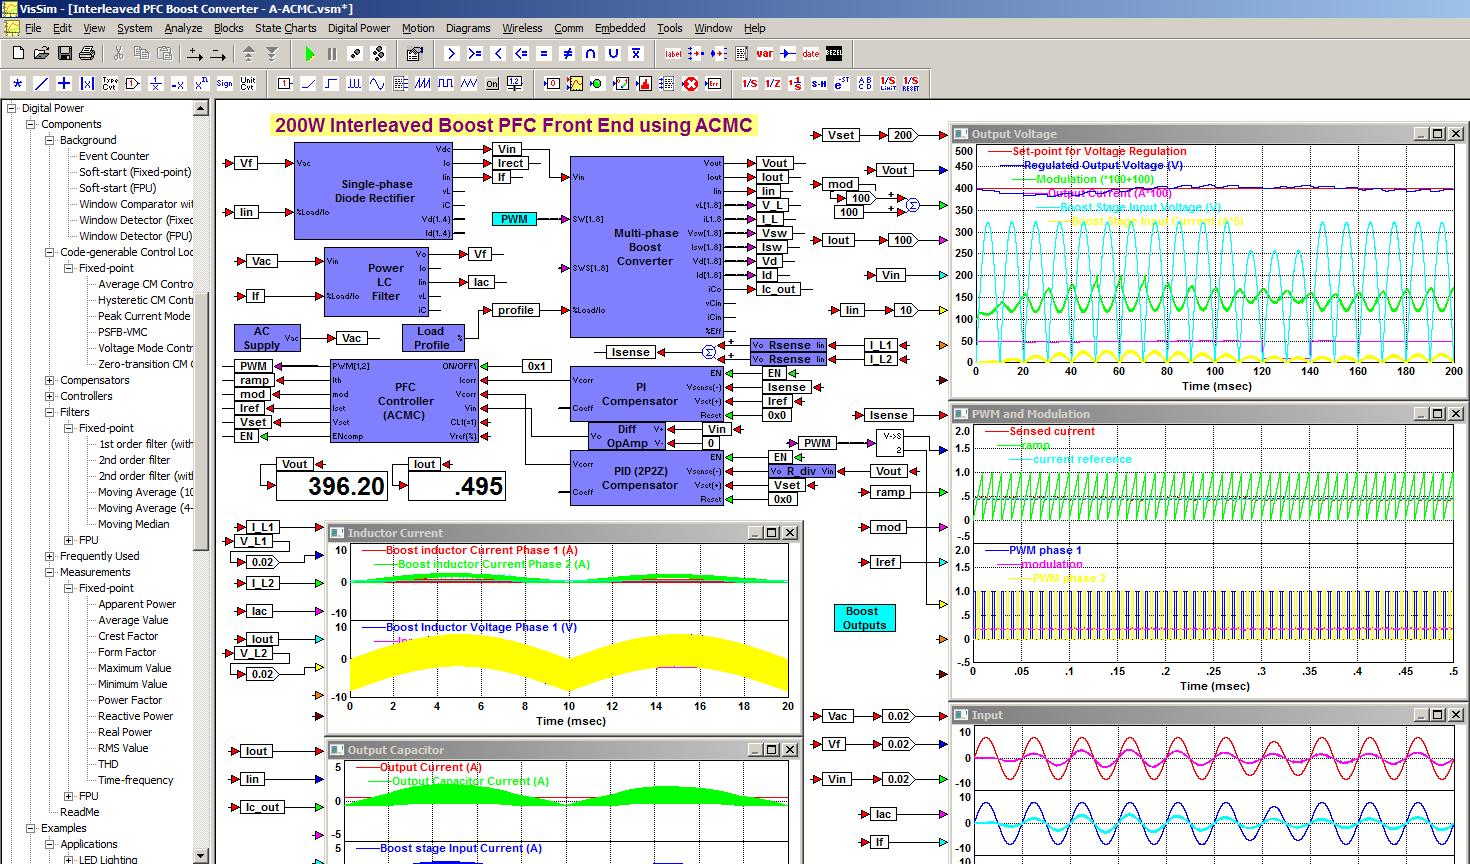 Working with VisSim 6.0 full license